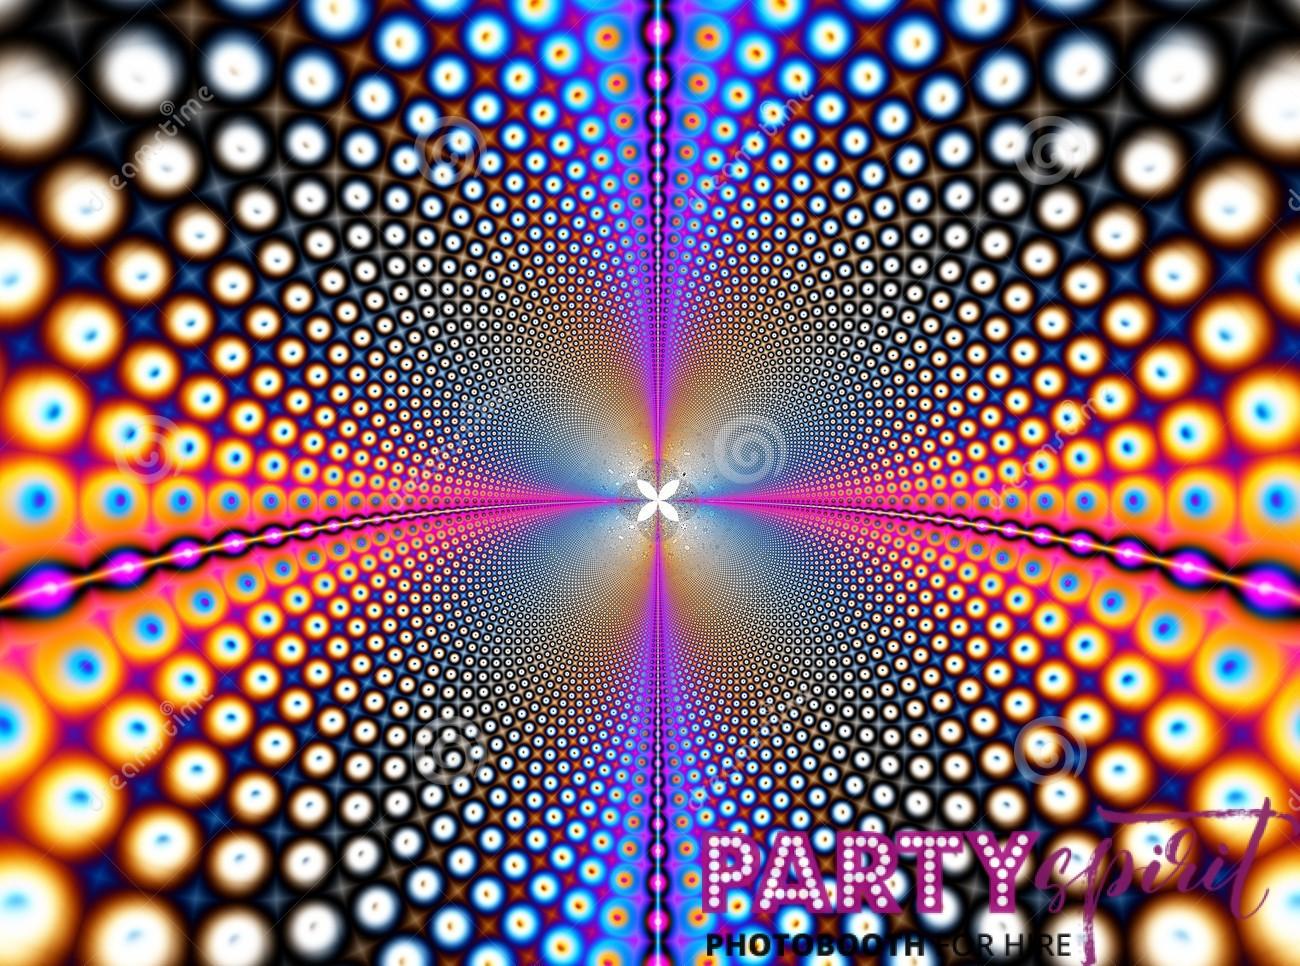 Photo Booth Backgrounds - PartySpiritPhotoBooth com